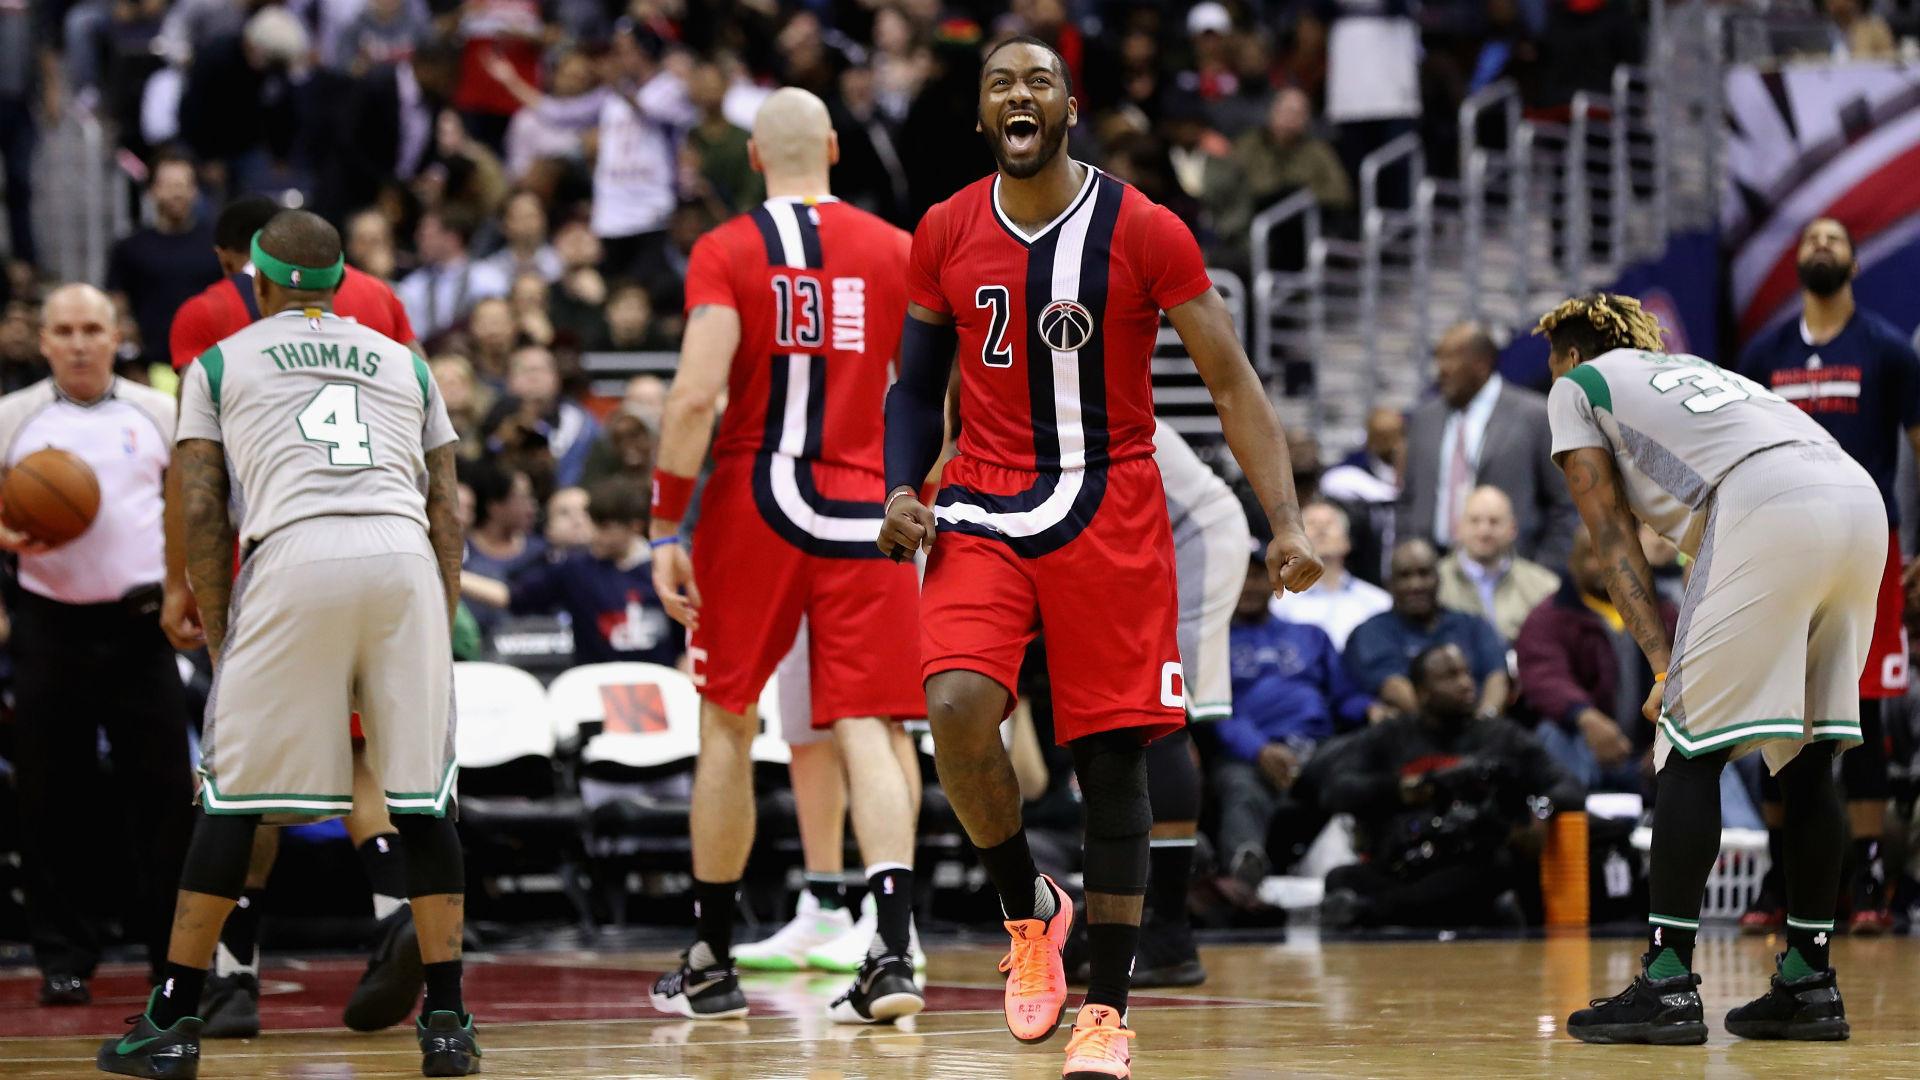 John Wall's quiet rage keeps burning, even after All-Star berth | NBA |  Sporting News